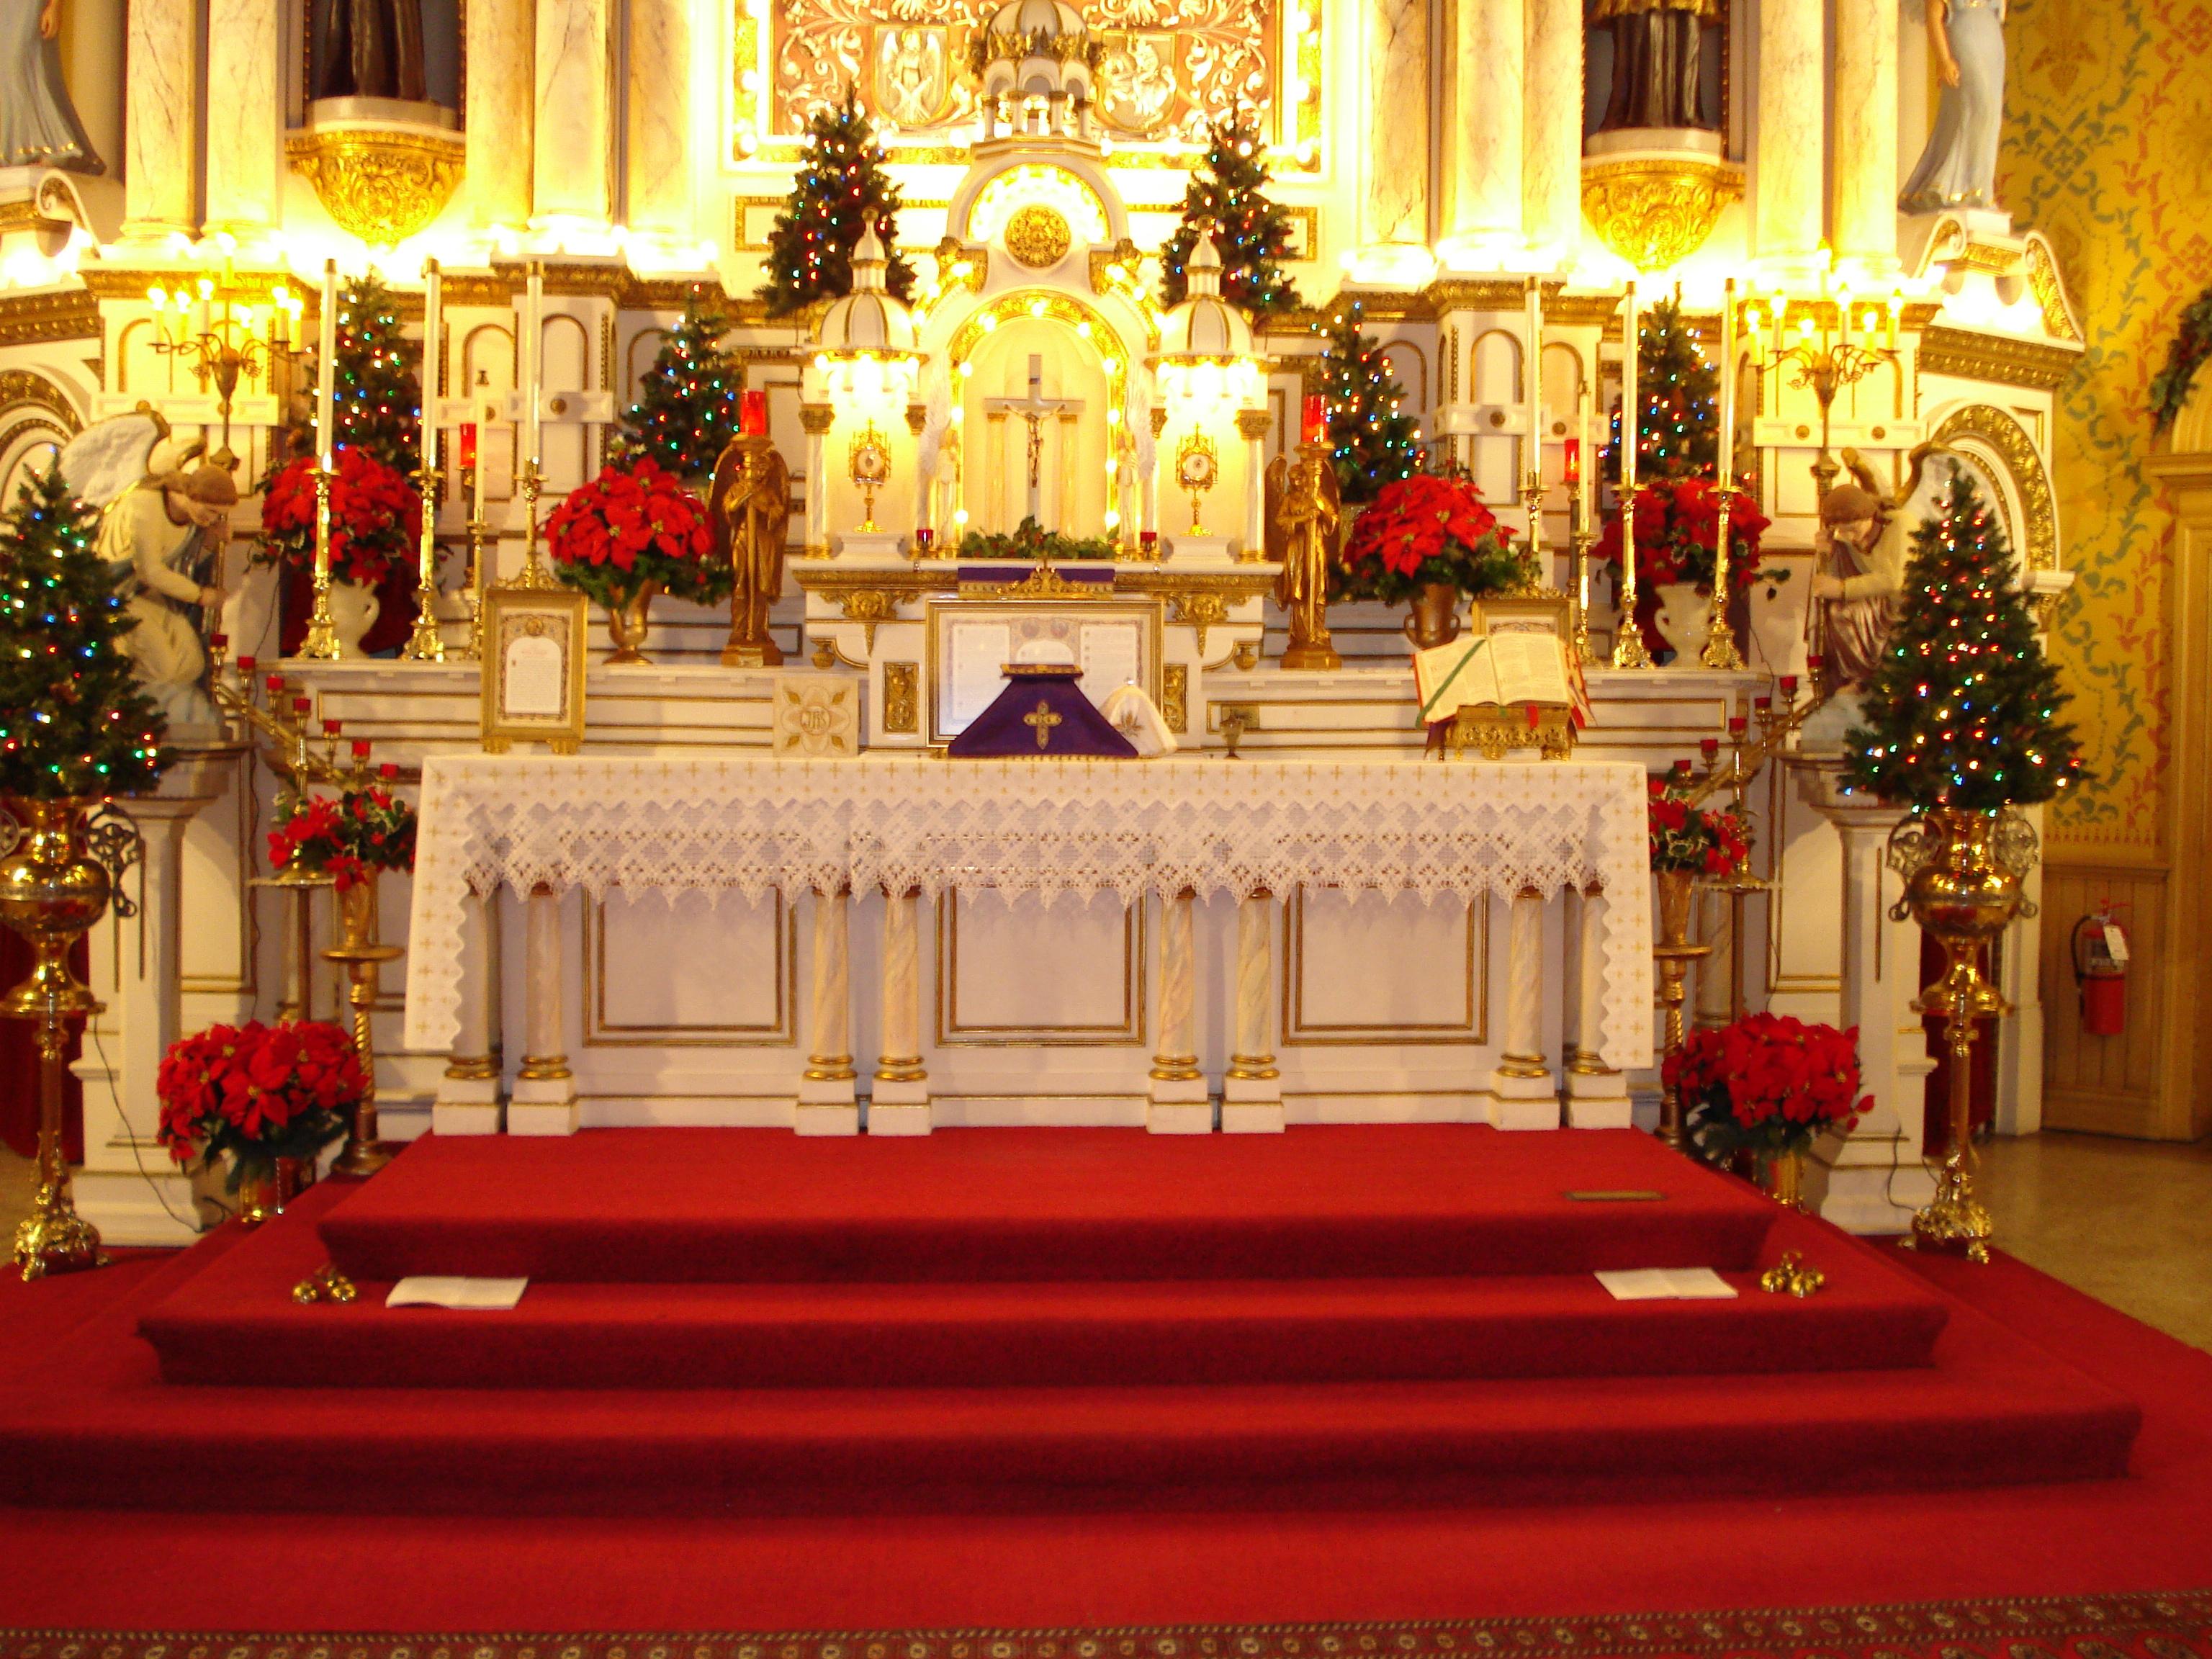 File:Altar St.Josaphat.JPG - Wikipedia